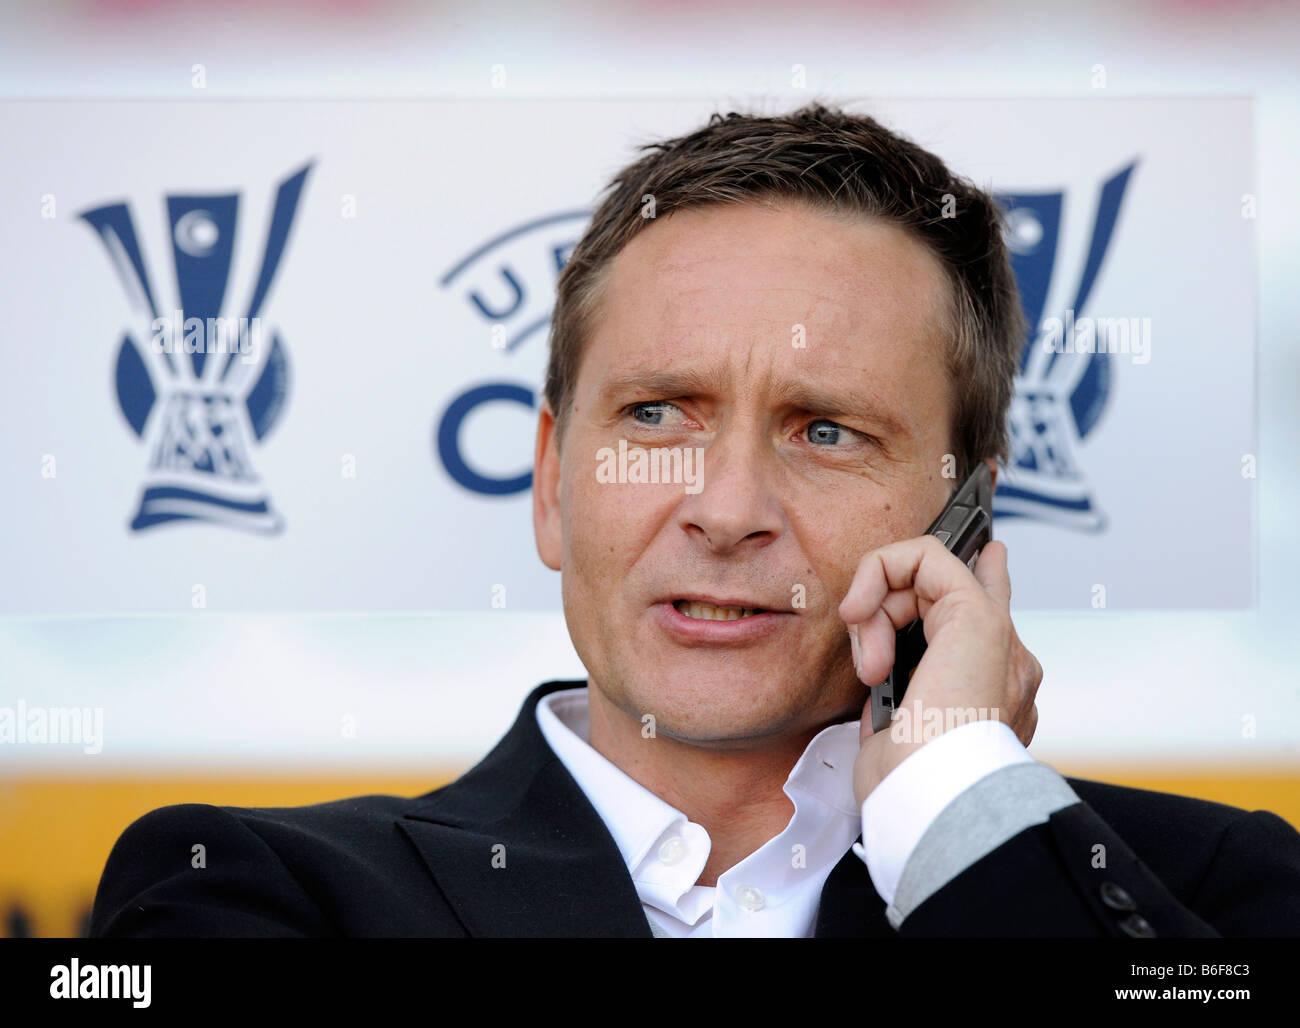 Manager Horst HELDT, VfB Stuttgart on his mobile, UEFA-Cup logo behind him, Stuttgart, Germany, Europe Stock Photo